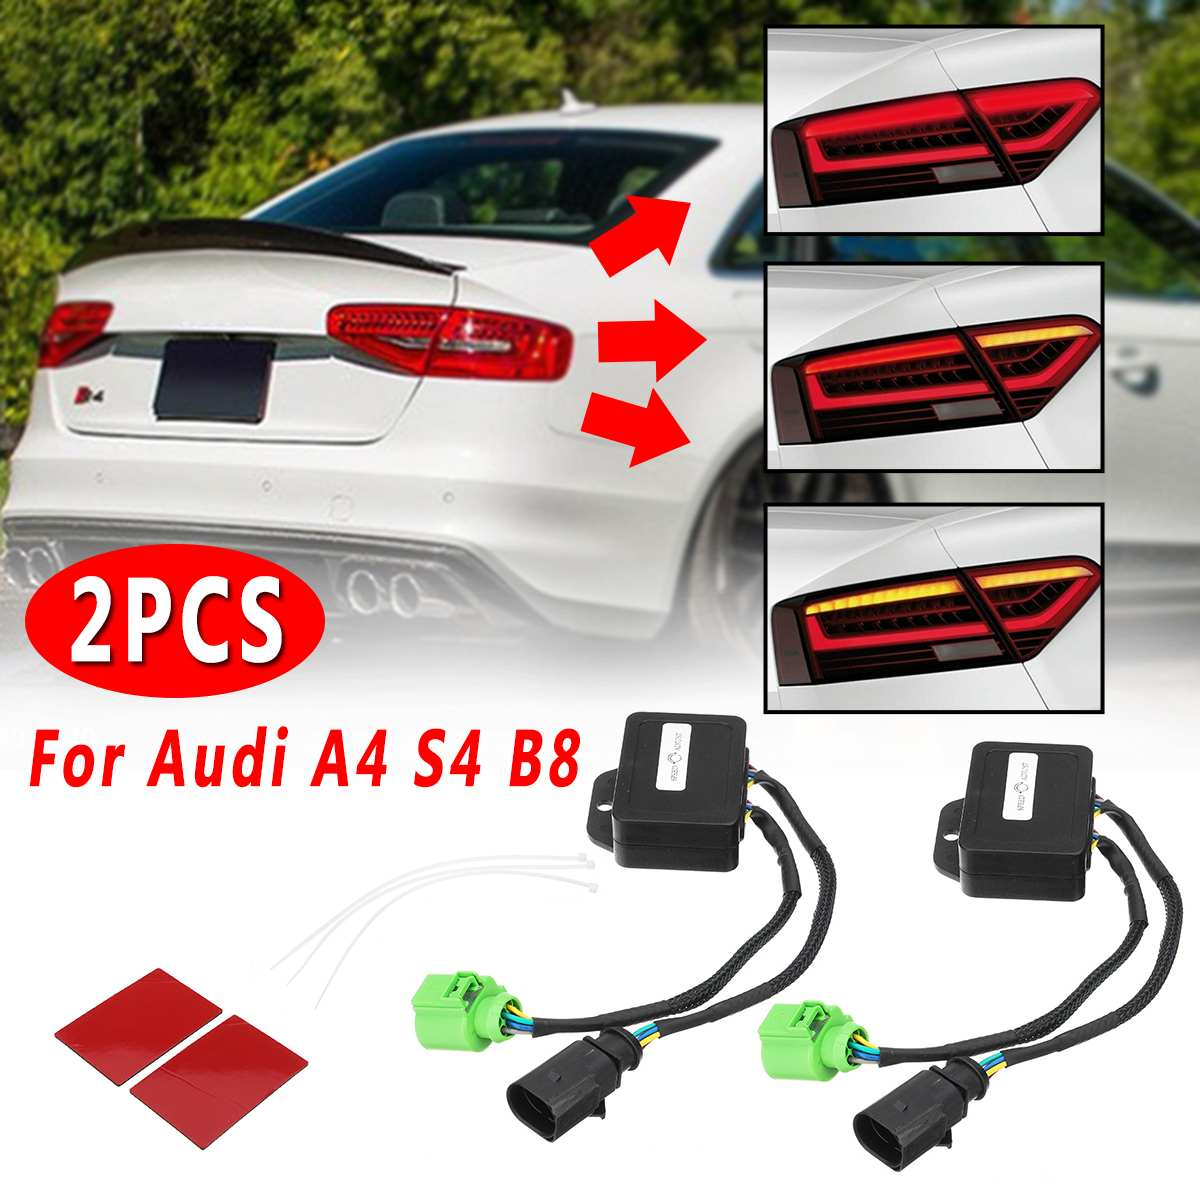 2 Pcs LED Taillights For Audi A4 S4 B8 2012 2018 sedan  Limo Semi Dynamic Turn Signal Indicator Signal Lamp    - AliExpress